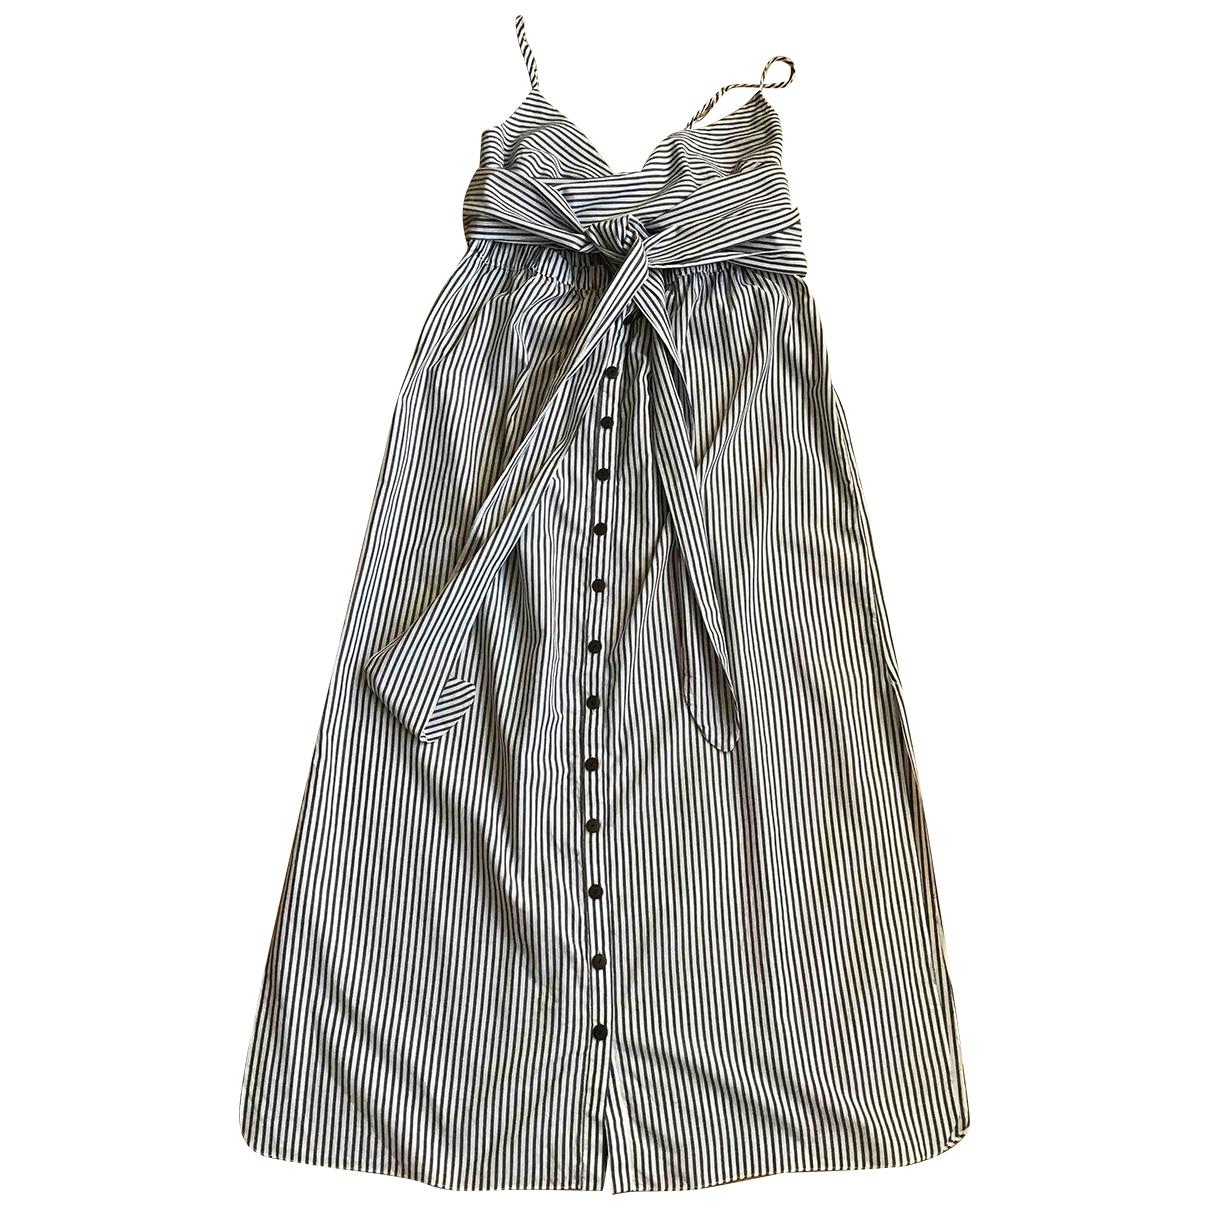 Mara Hoffman - Robe   pour femme en coton - multicolore